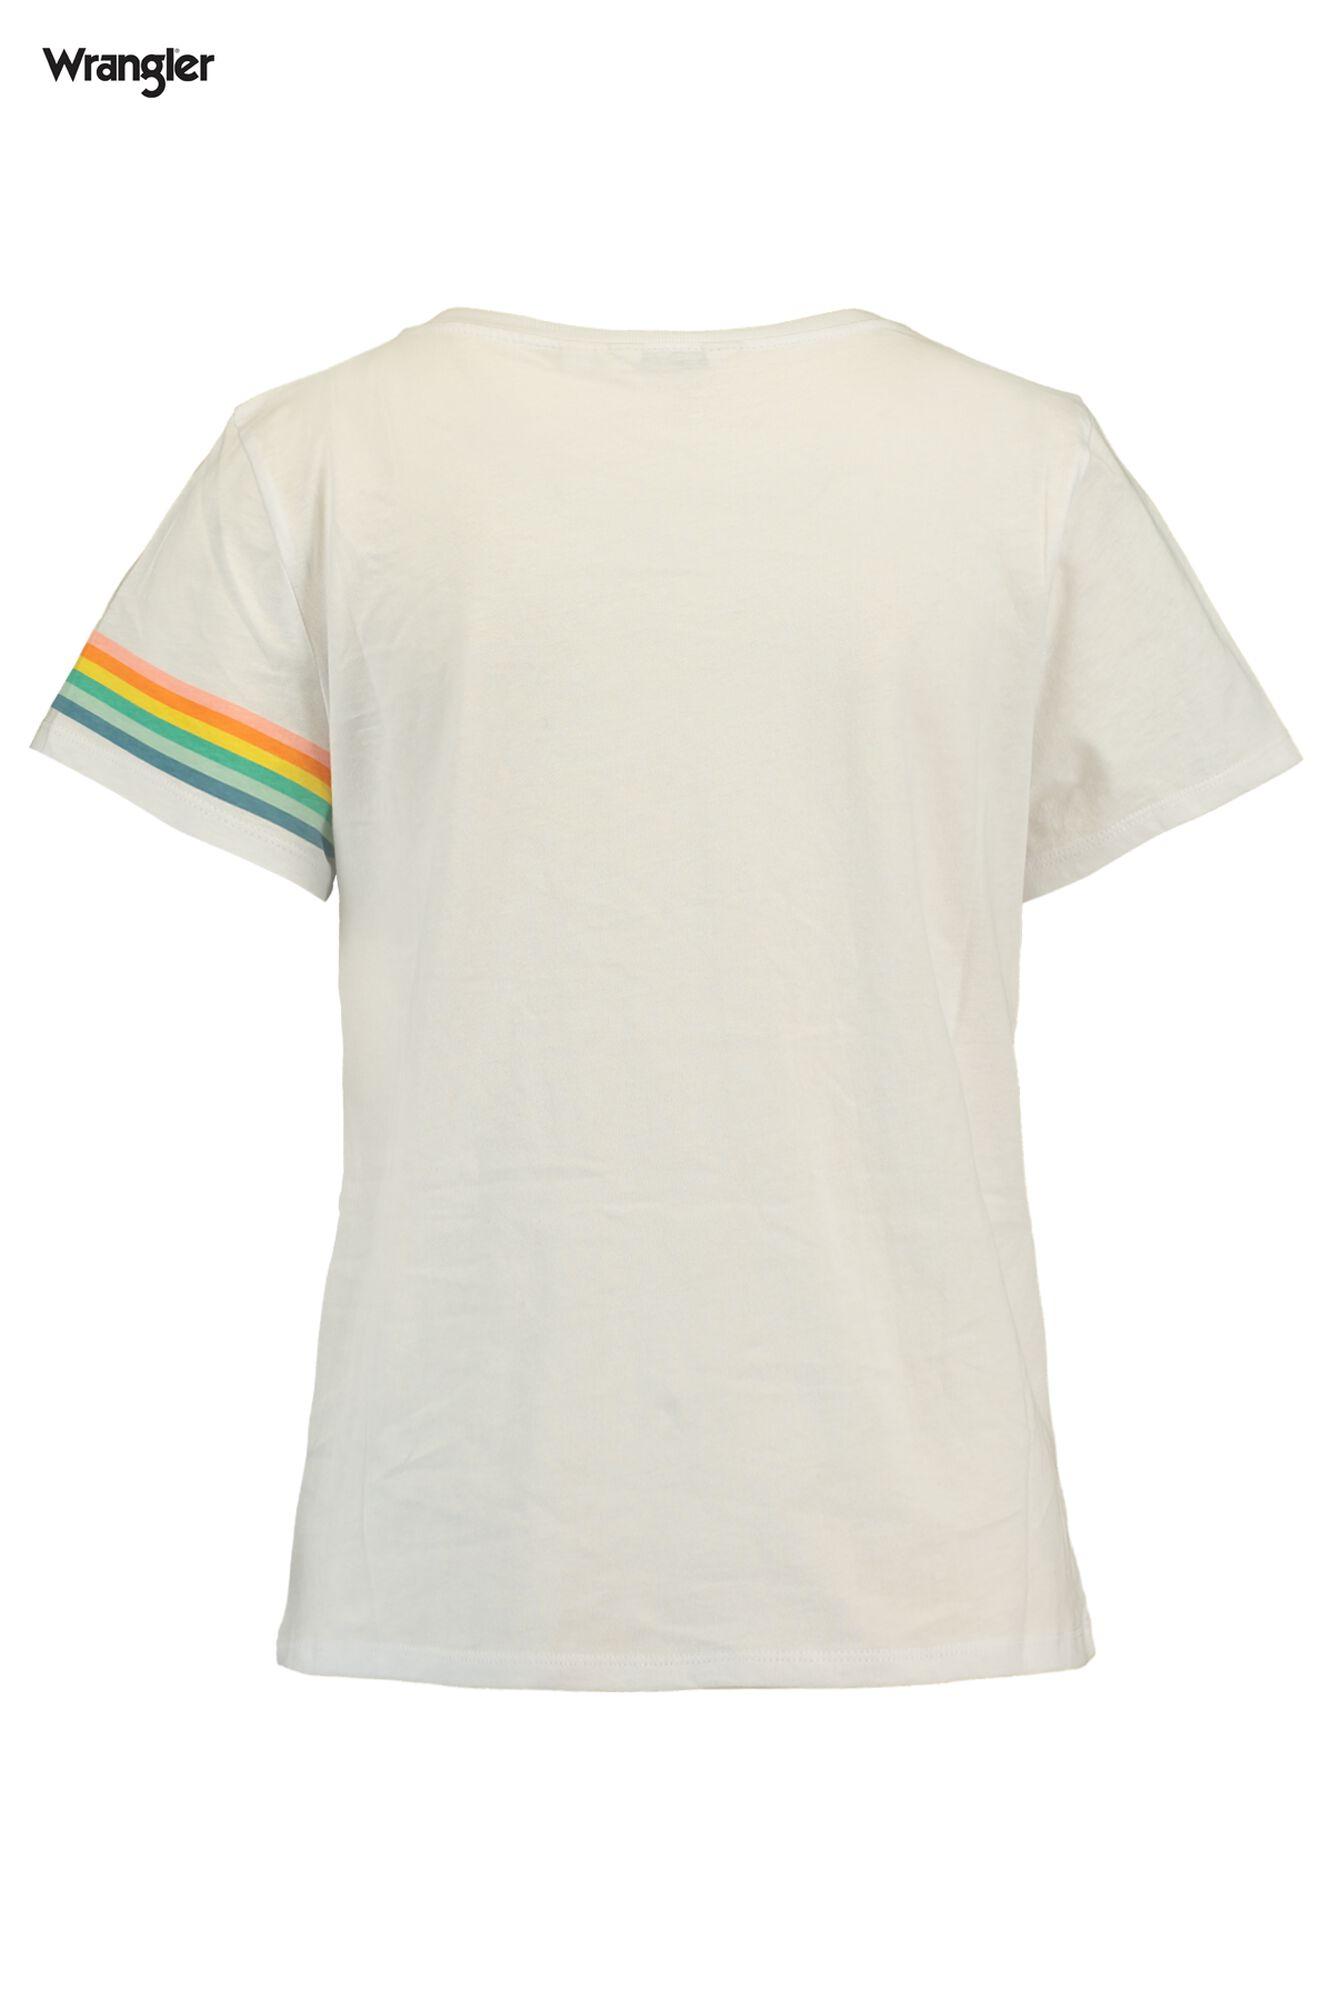 63a2a85b Women T-shirt Wrangler Rainbow White Buy Online